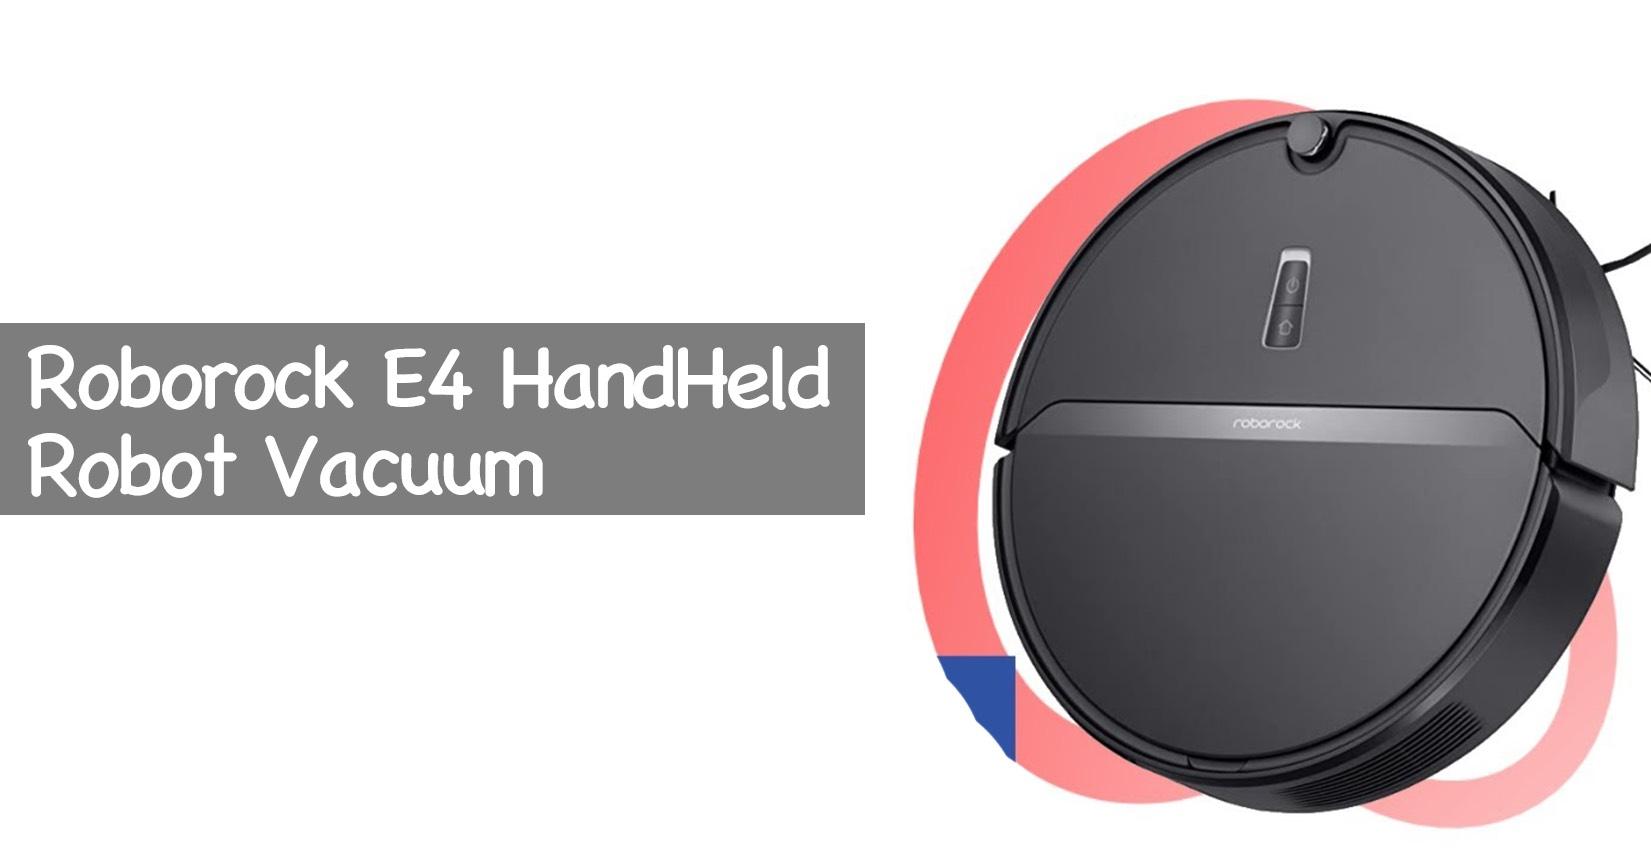 Roborock E4 HandHeld Robot Vacuum